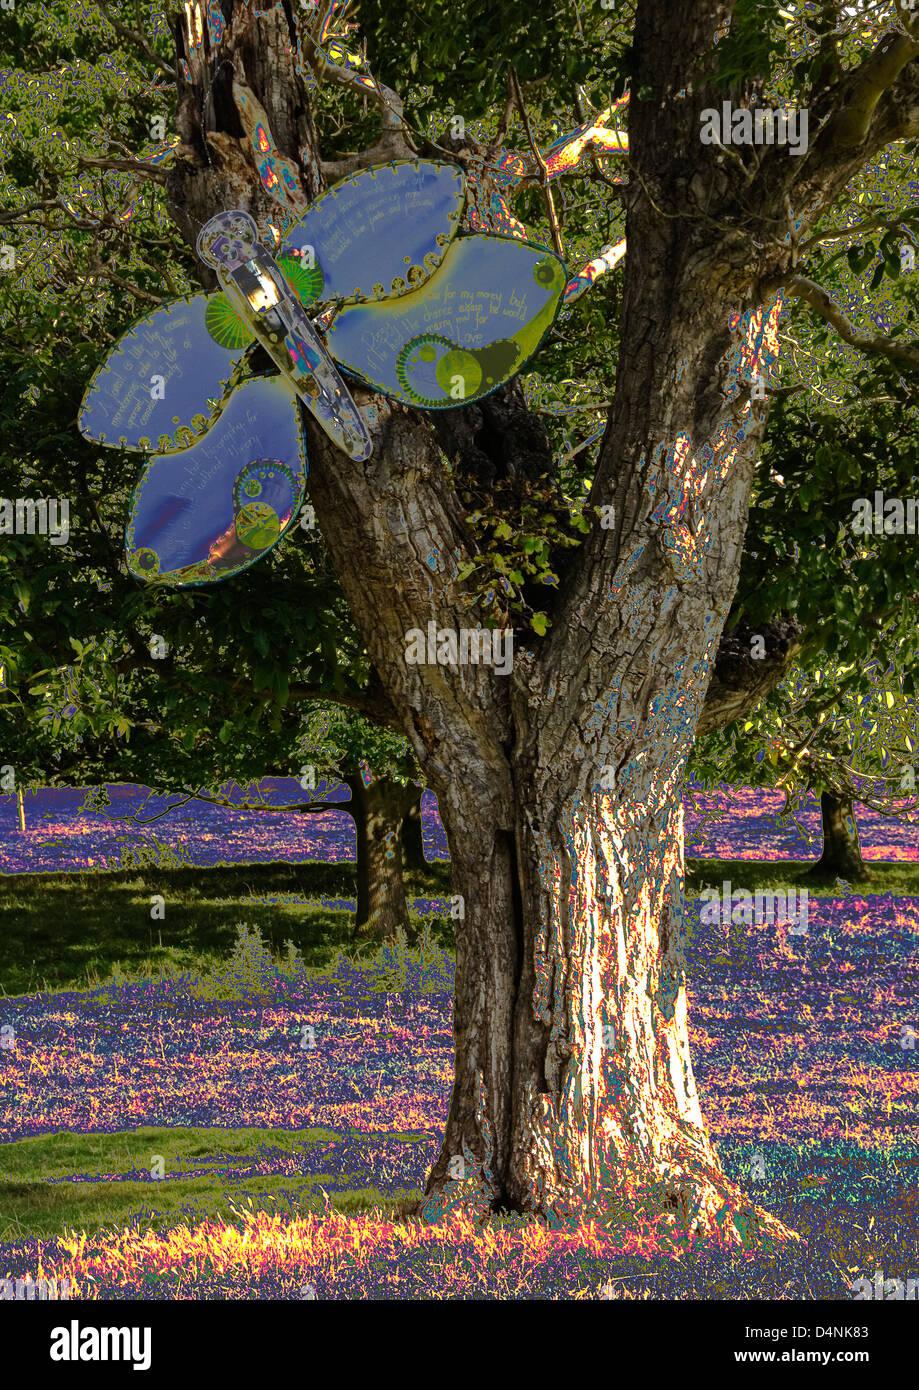 Bucks - Hughenden estate - colourful open air sculpture - giant moth on a tree - computer enhanced interpretation - Stock Image